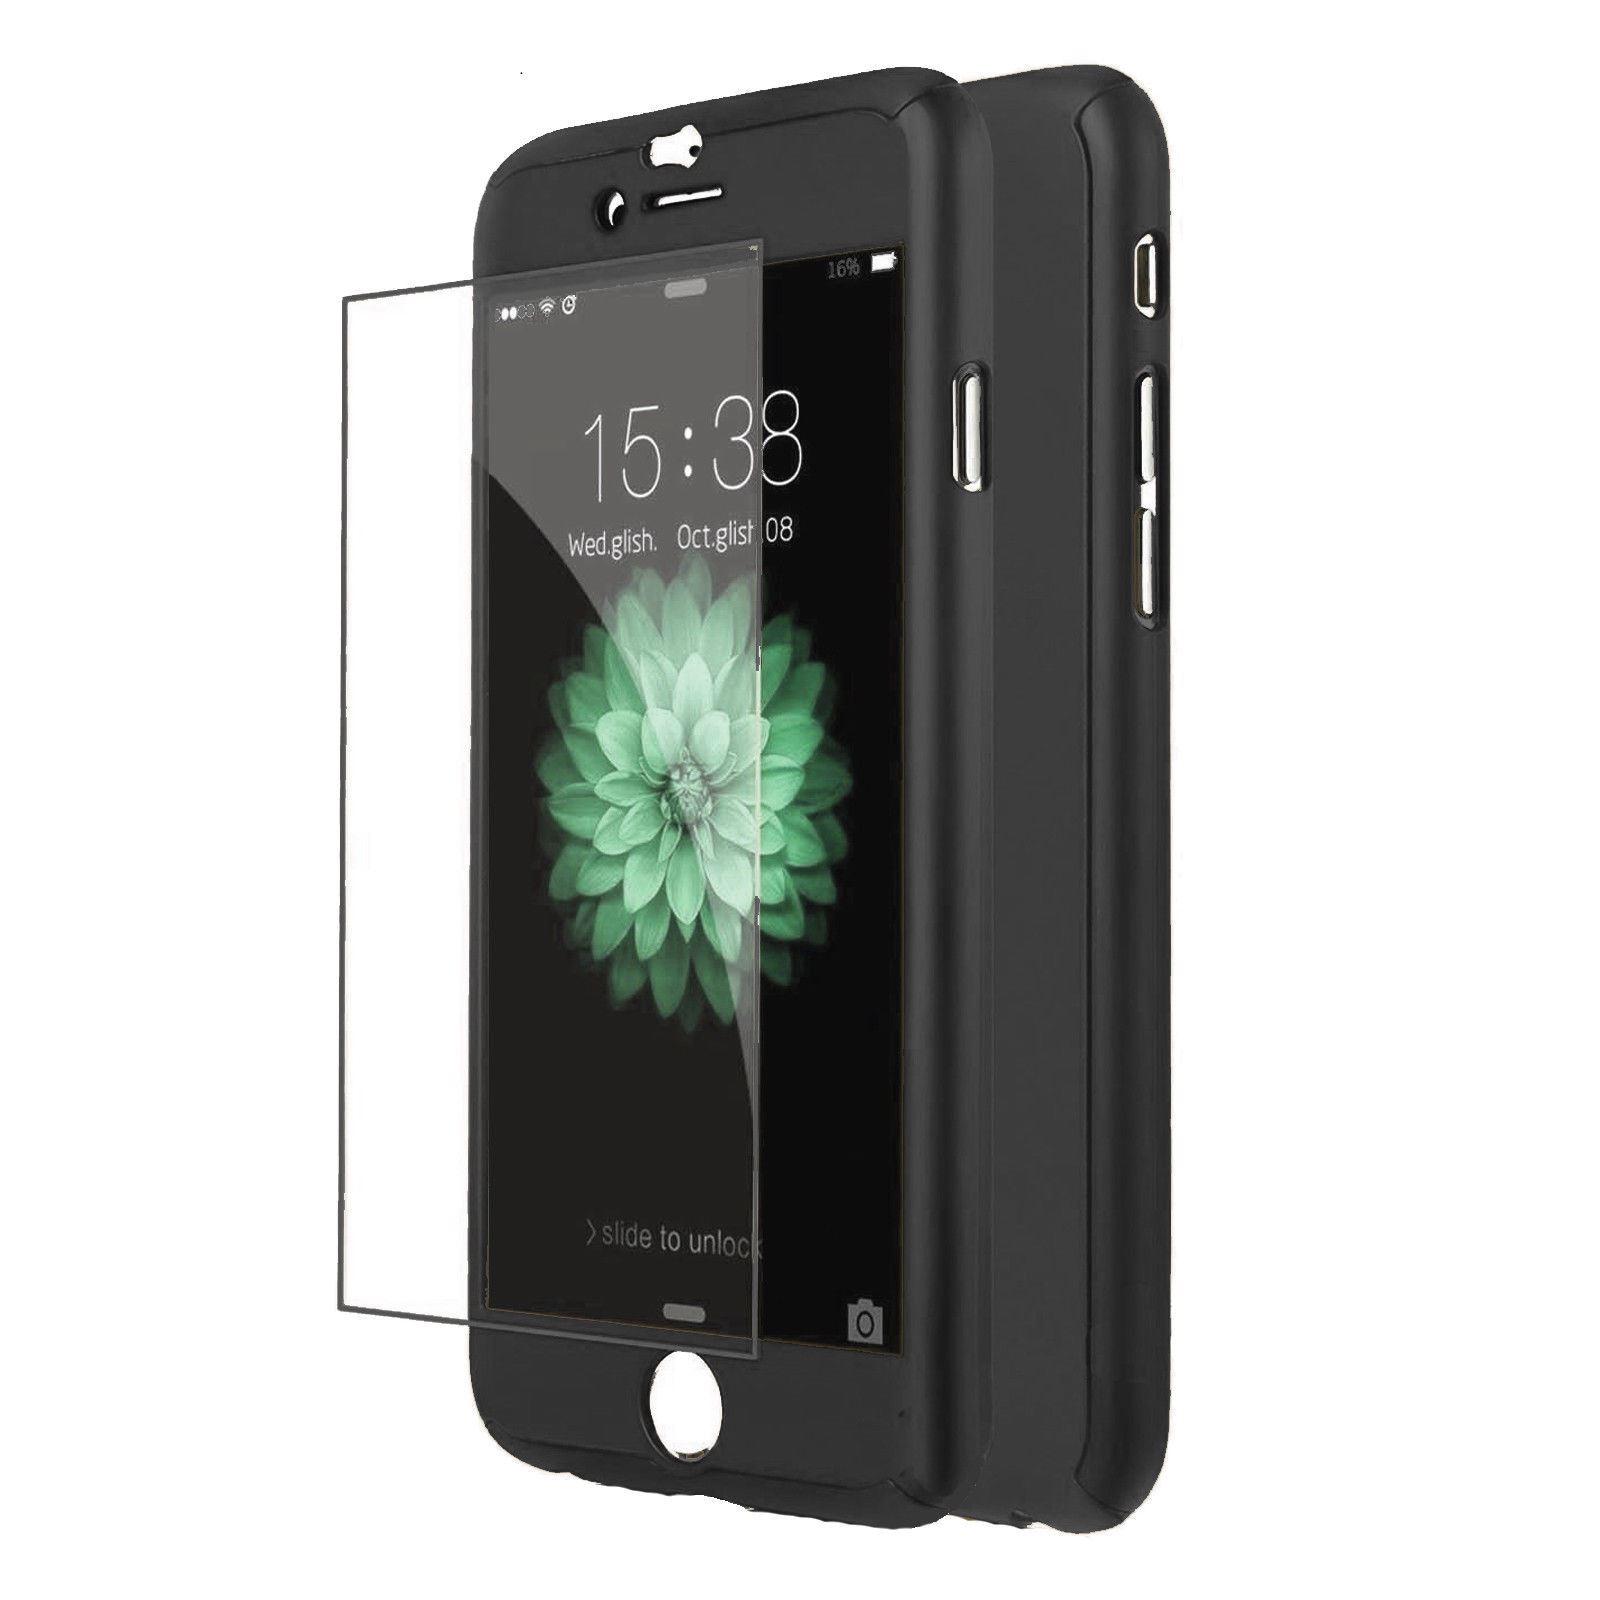 5x-Funda-360-hibrida-para-Iphone-6S-Negro-Cristal-Templado-Antigolpes-Carcasa